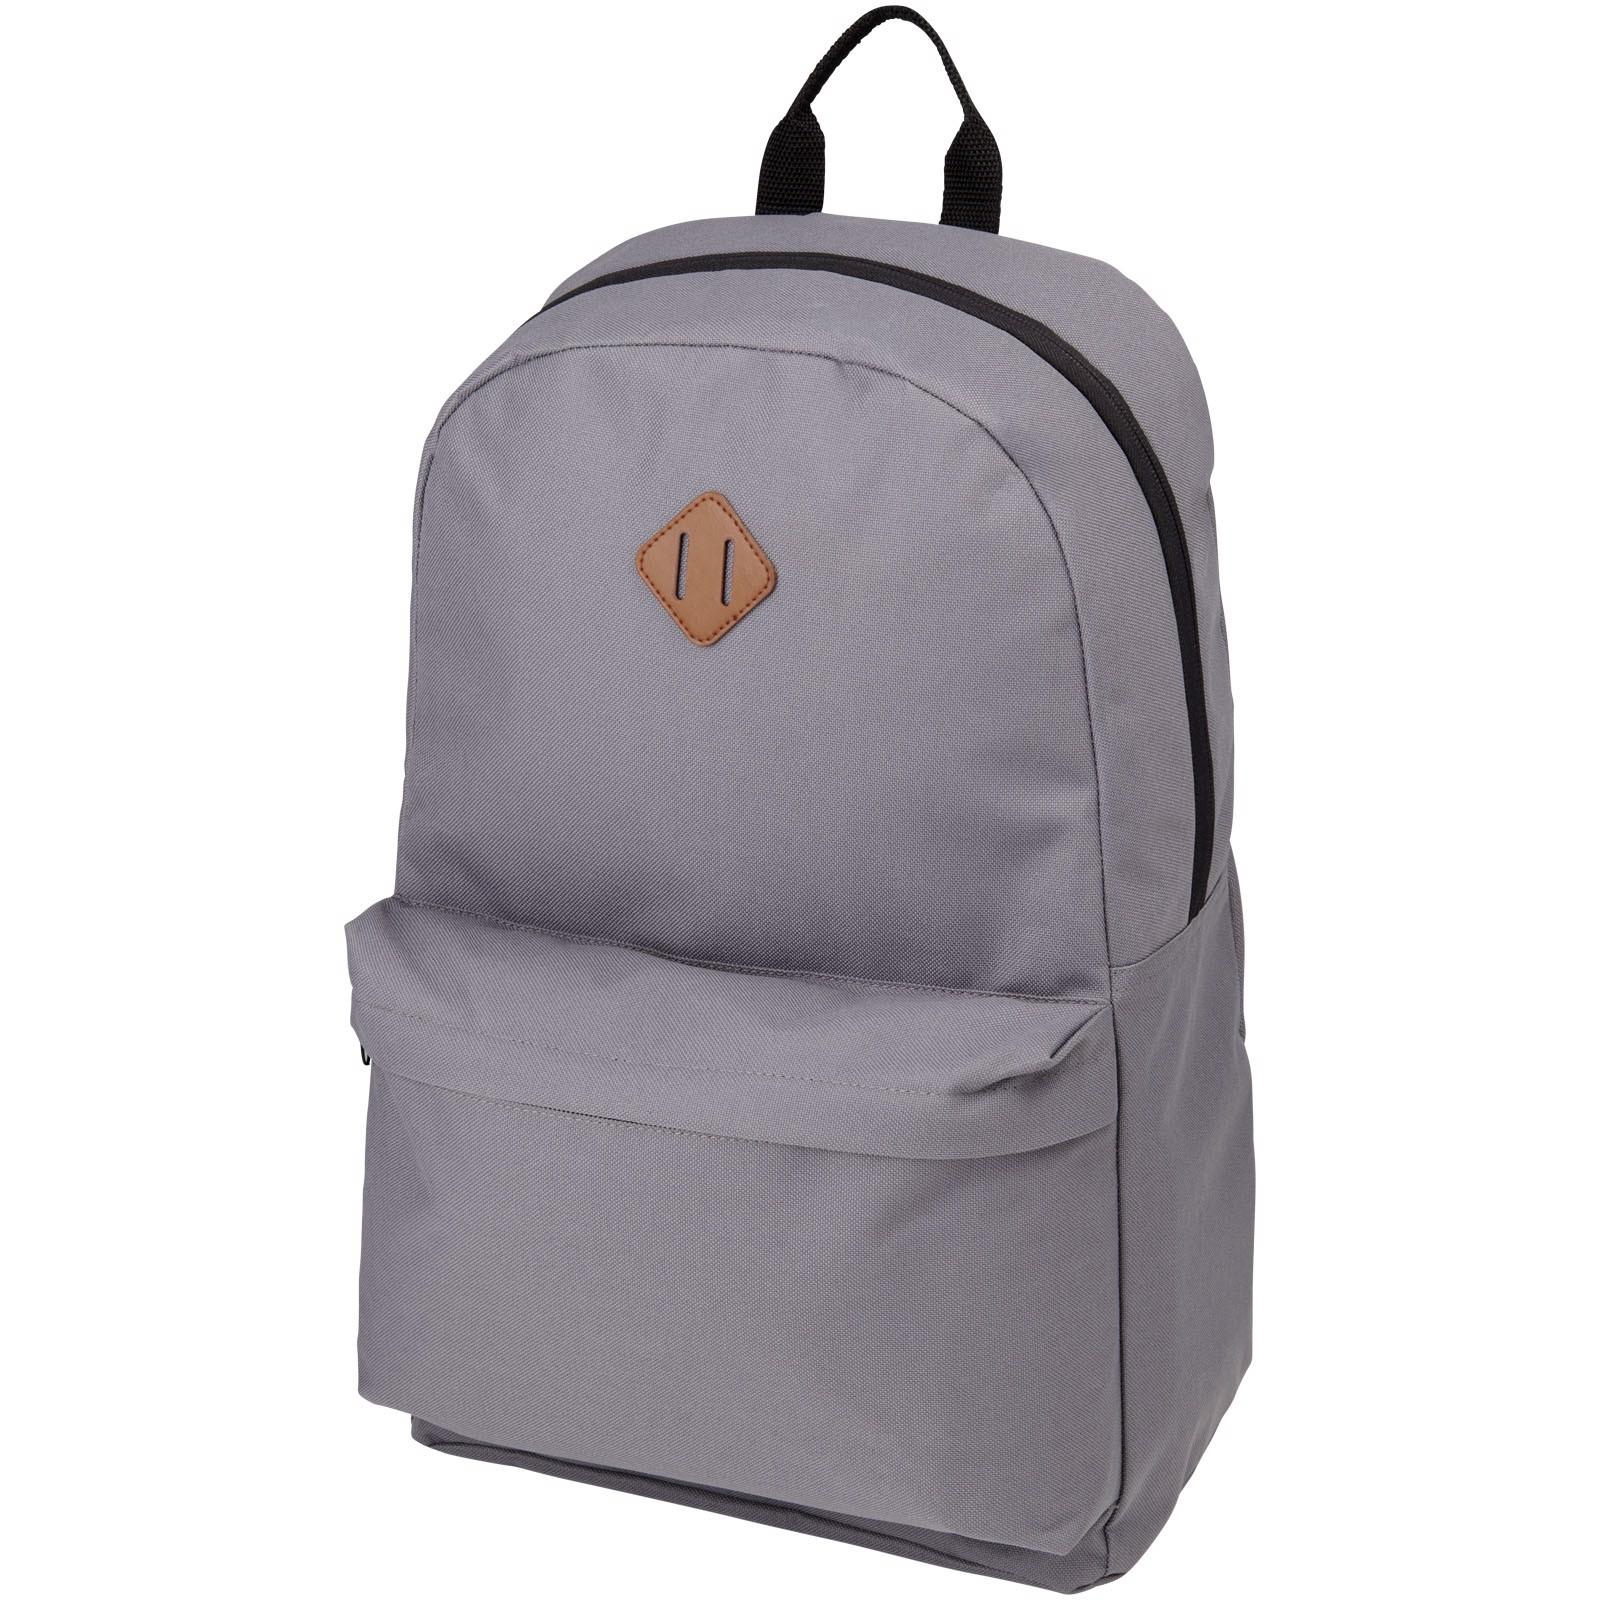 "Stratta 15"" laptop backpack - Grey"